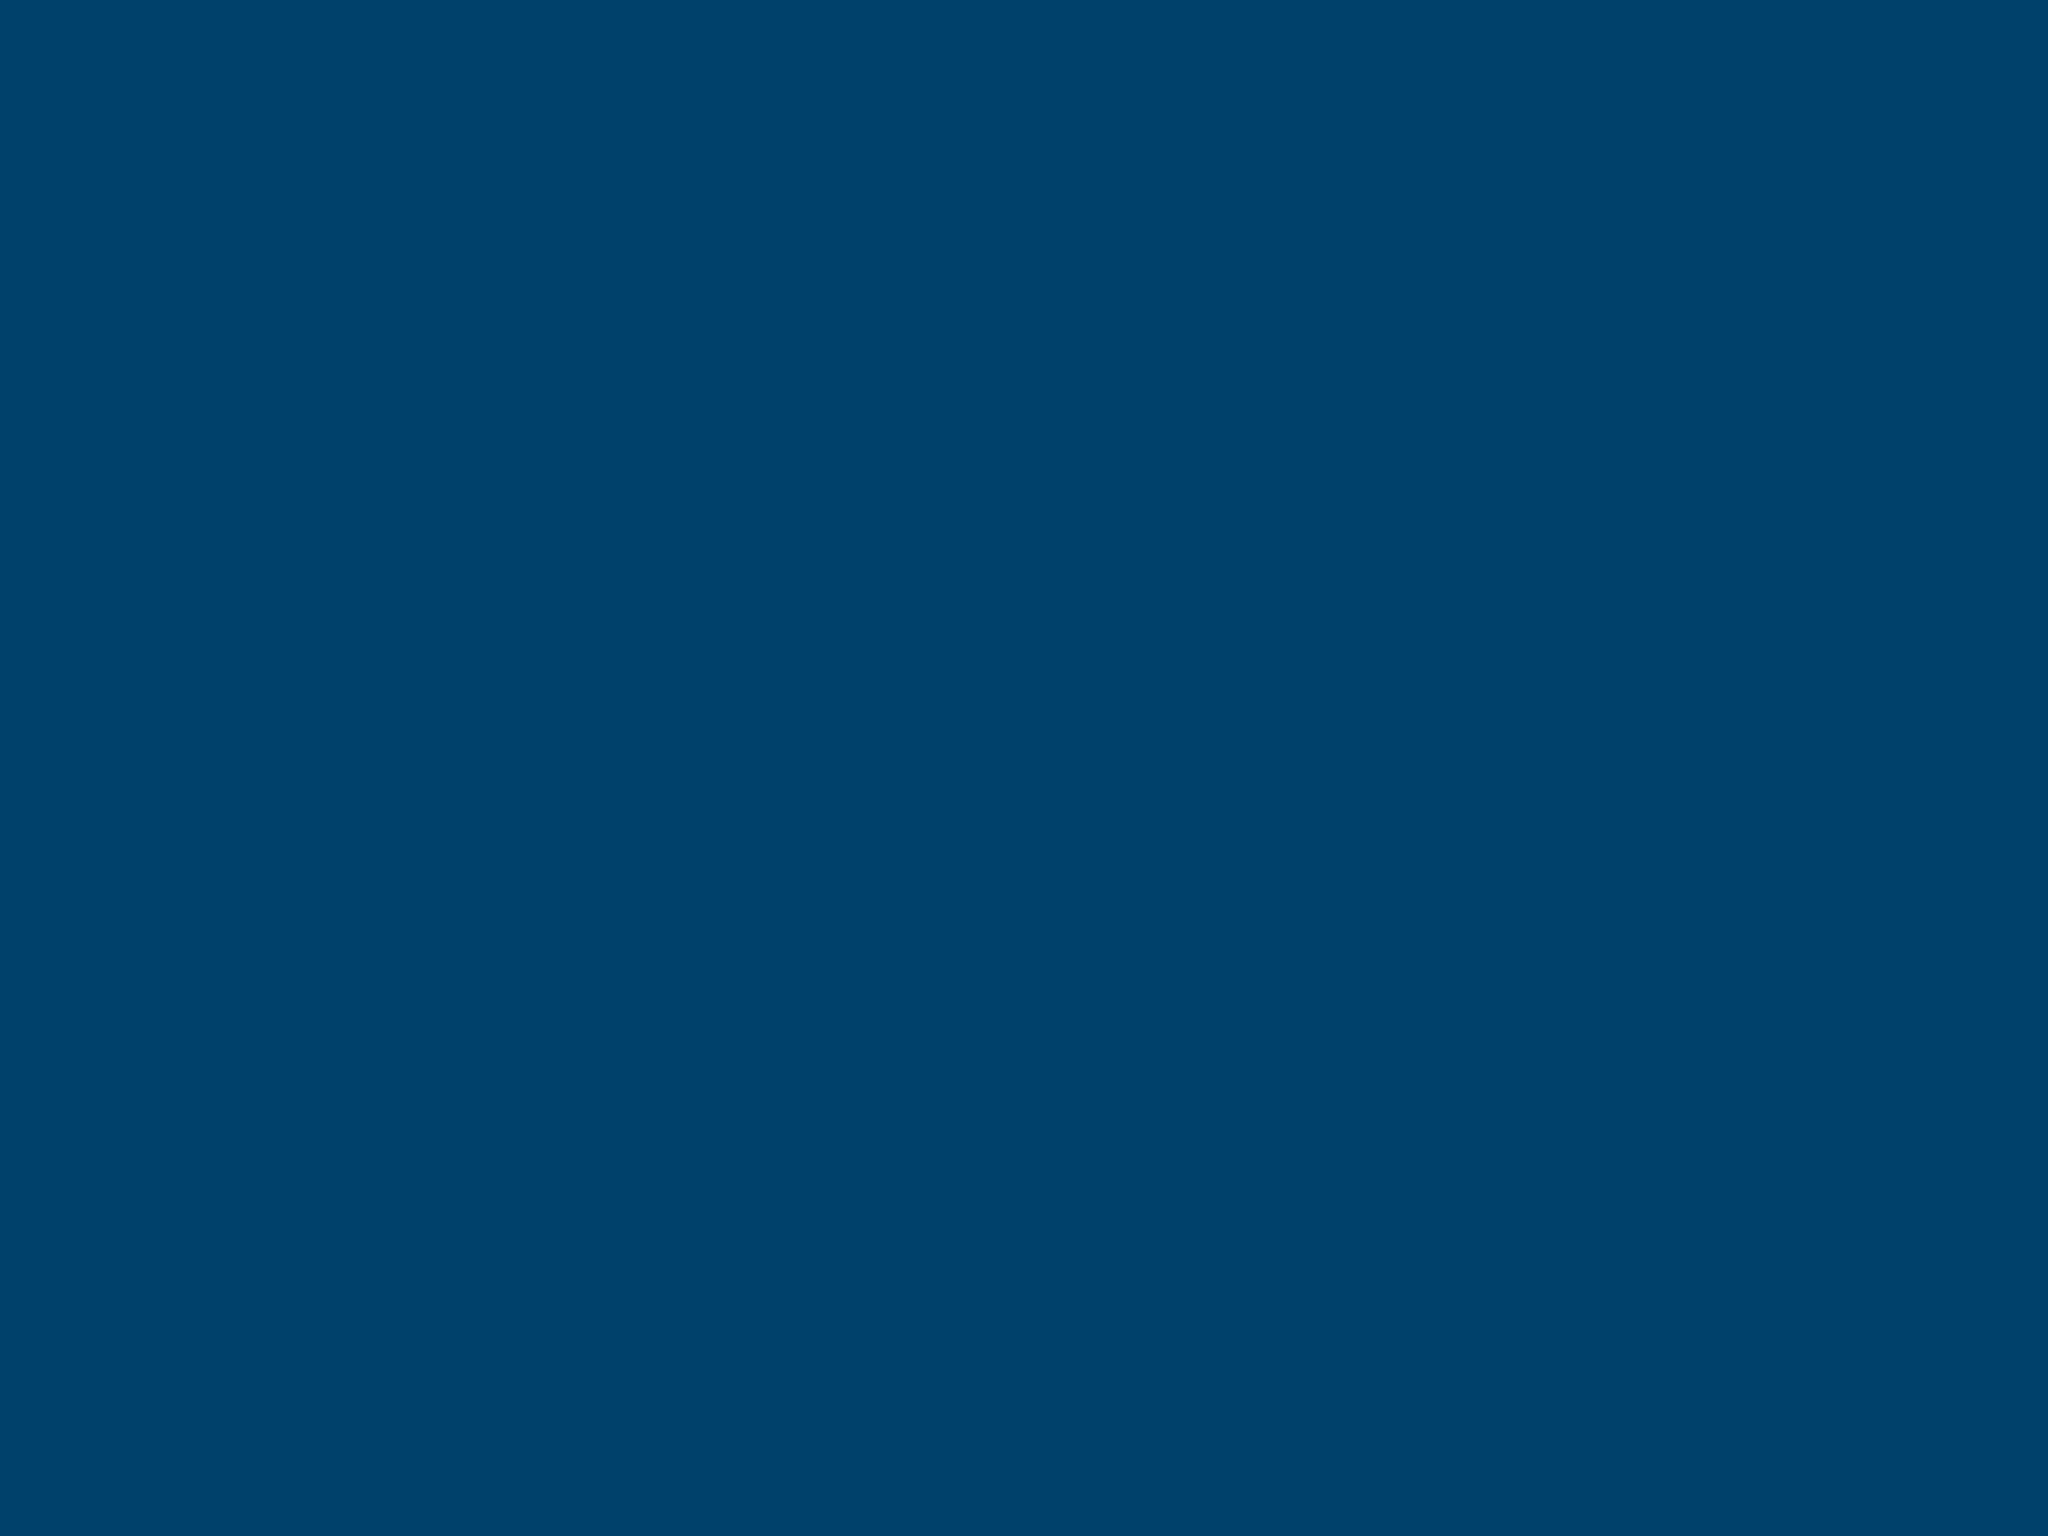 2048x1536 Indigo Dye Solid Color Background